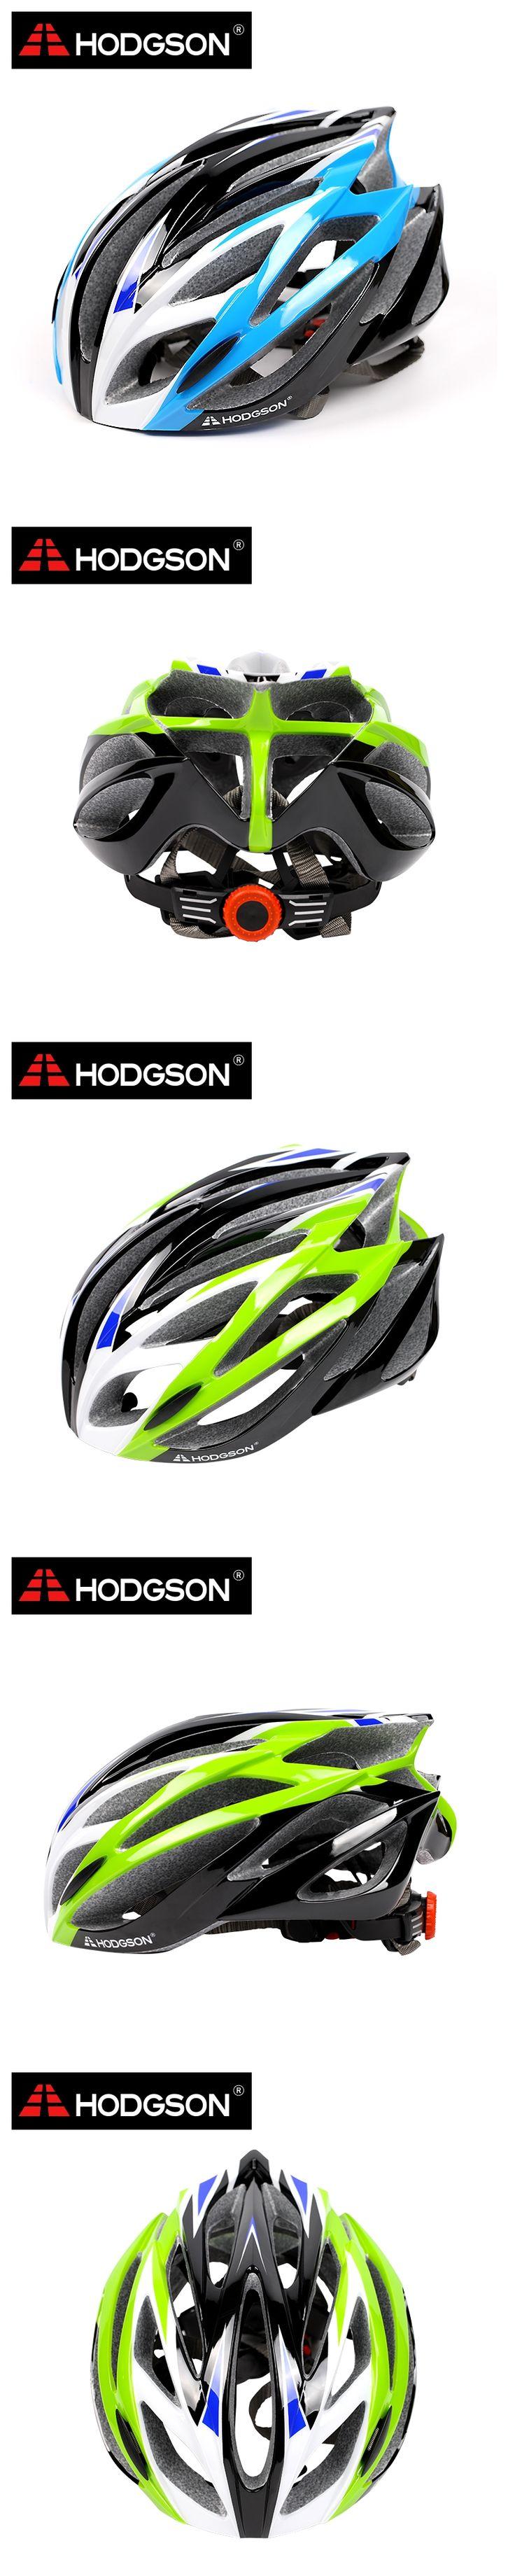 8015 2016 HODGSON New Ultralight 21 Vents Cycling Helmet Adjustable Road Bike Helmet Integrally-Molded Safety Bicycle Helmet